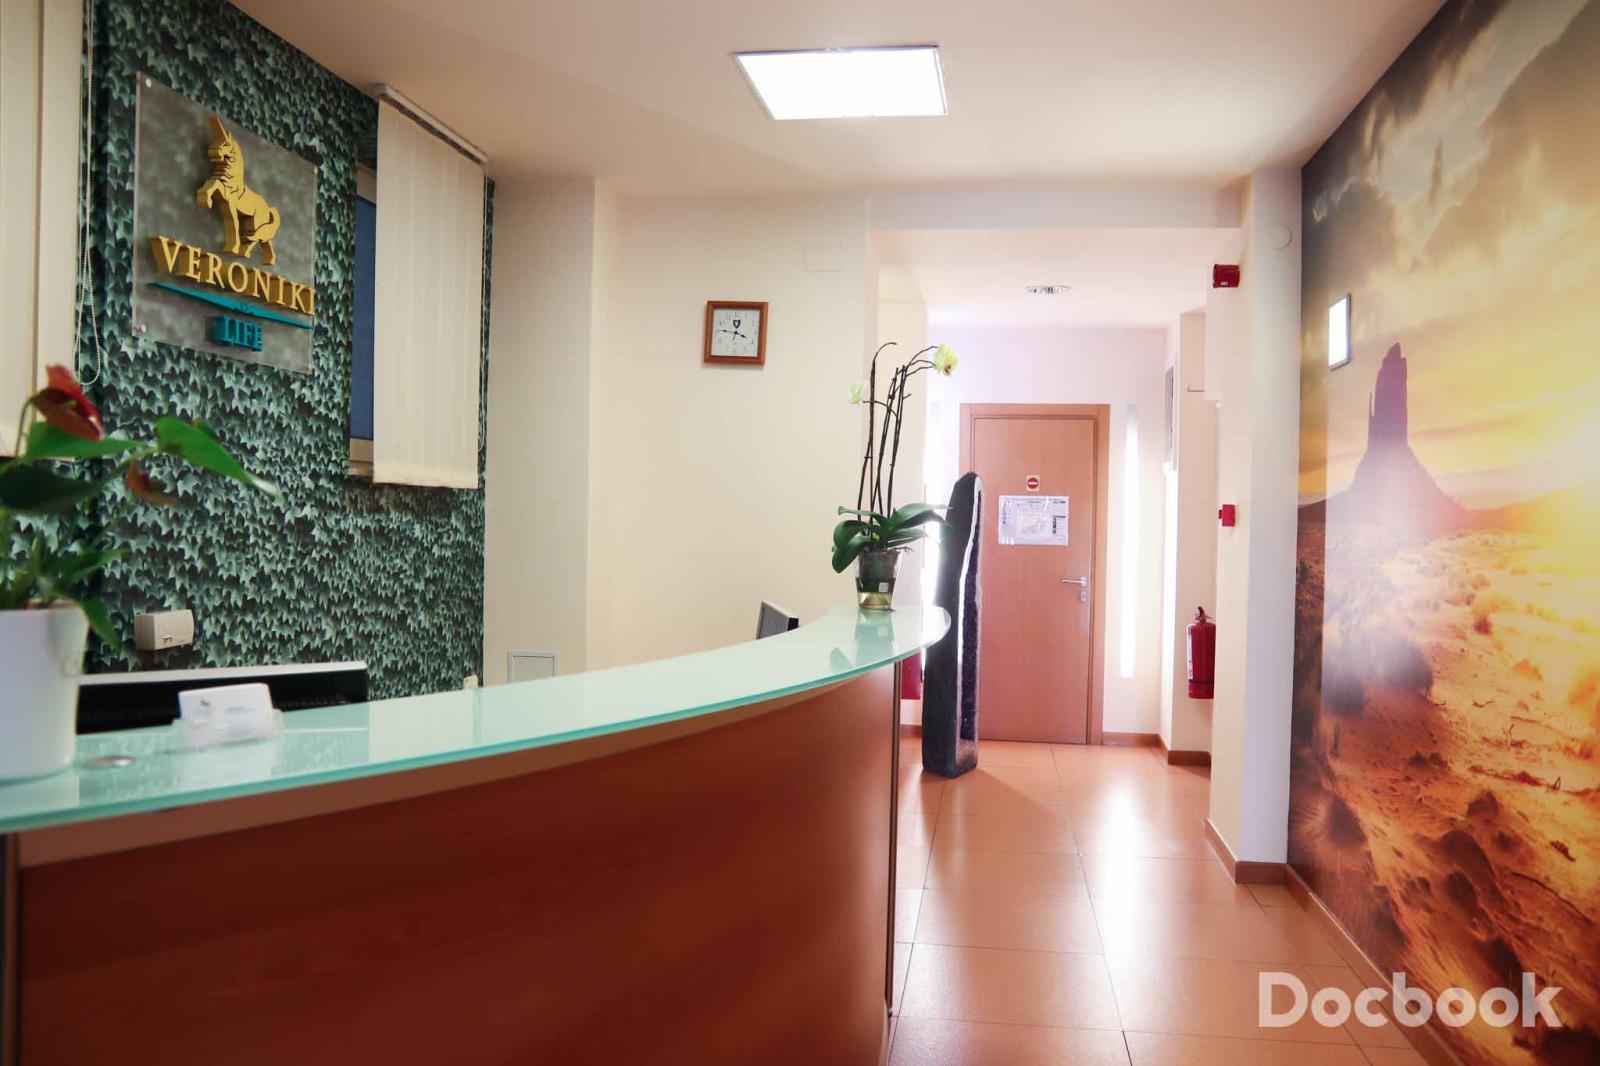 Clinica Veroniki Life - Clinica de medicina integrativa